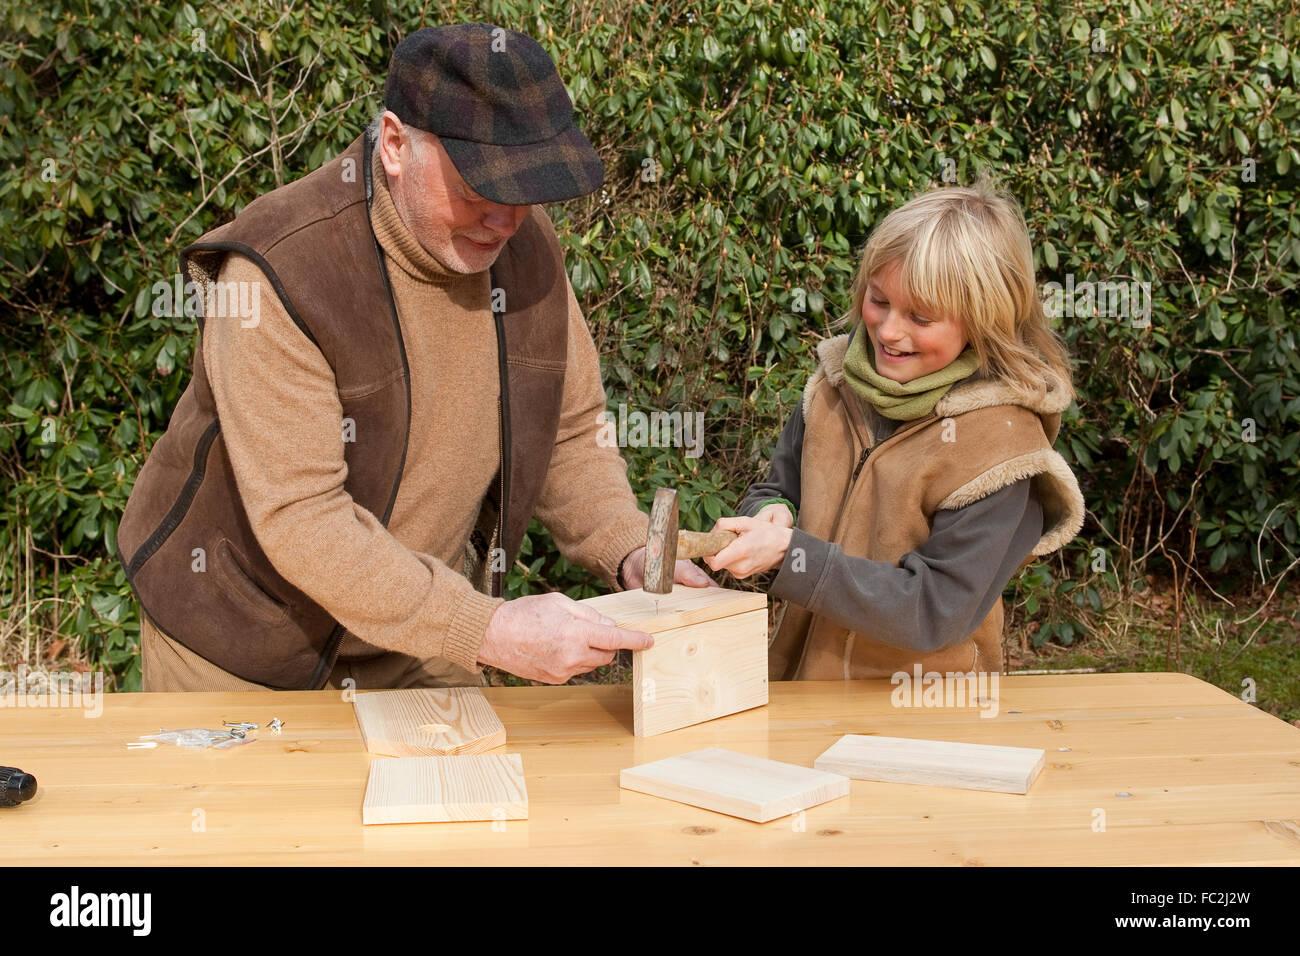 Nest box, birdhouse, building a nesting box, grandpa and grandchild, Nistkasten, Meisenkasten, Vogelnistkasten, Stock Photo